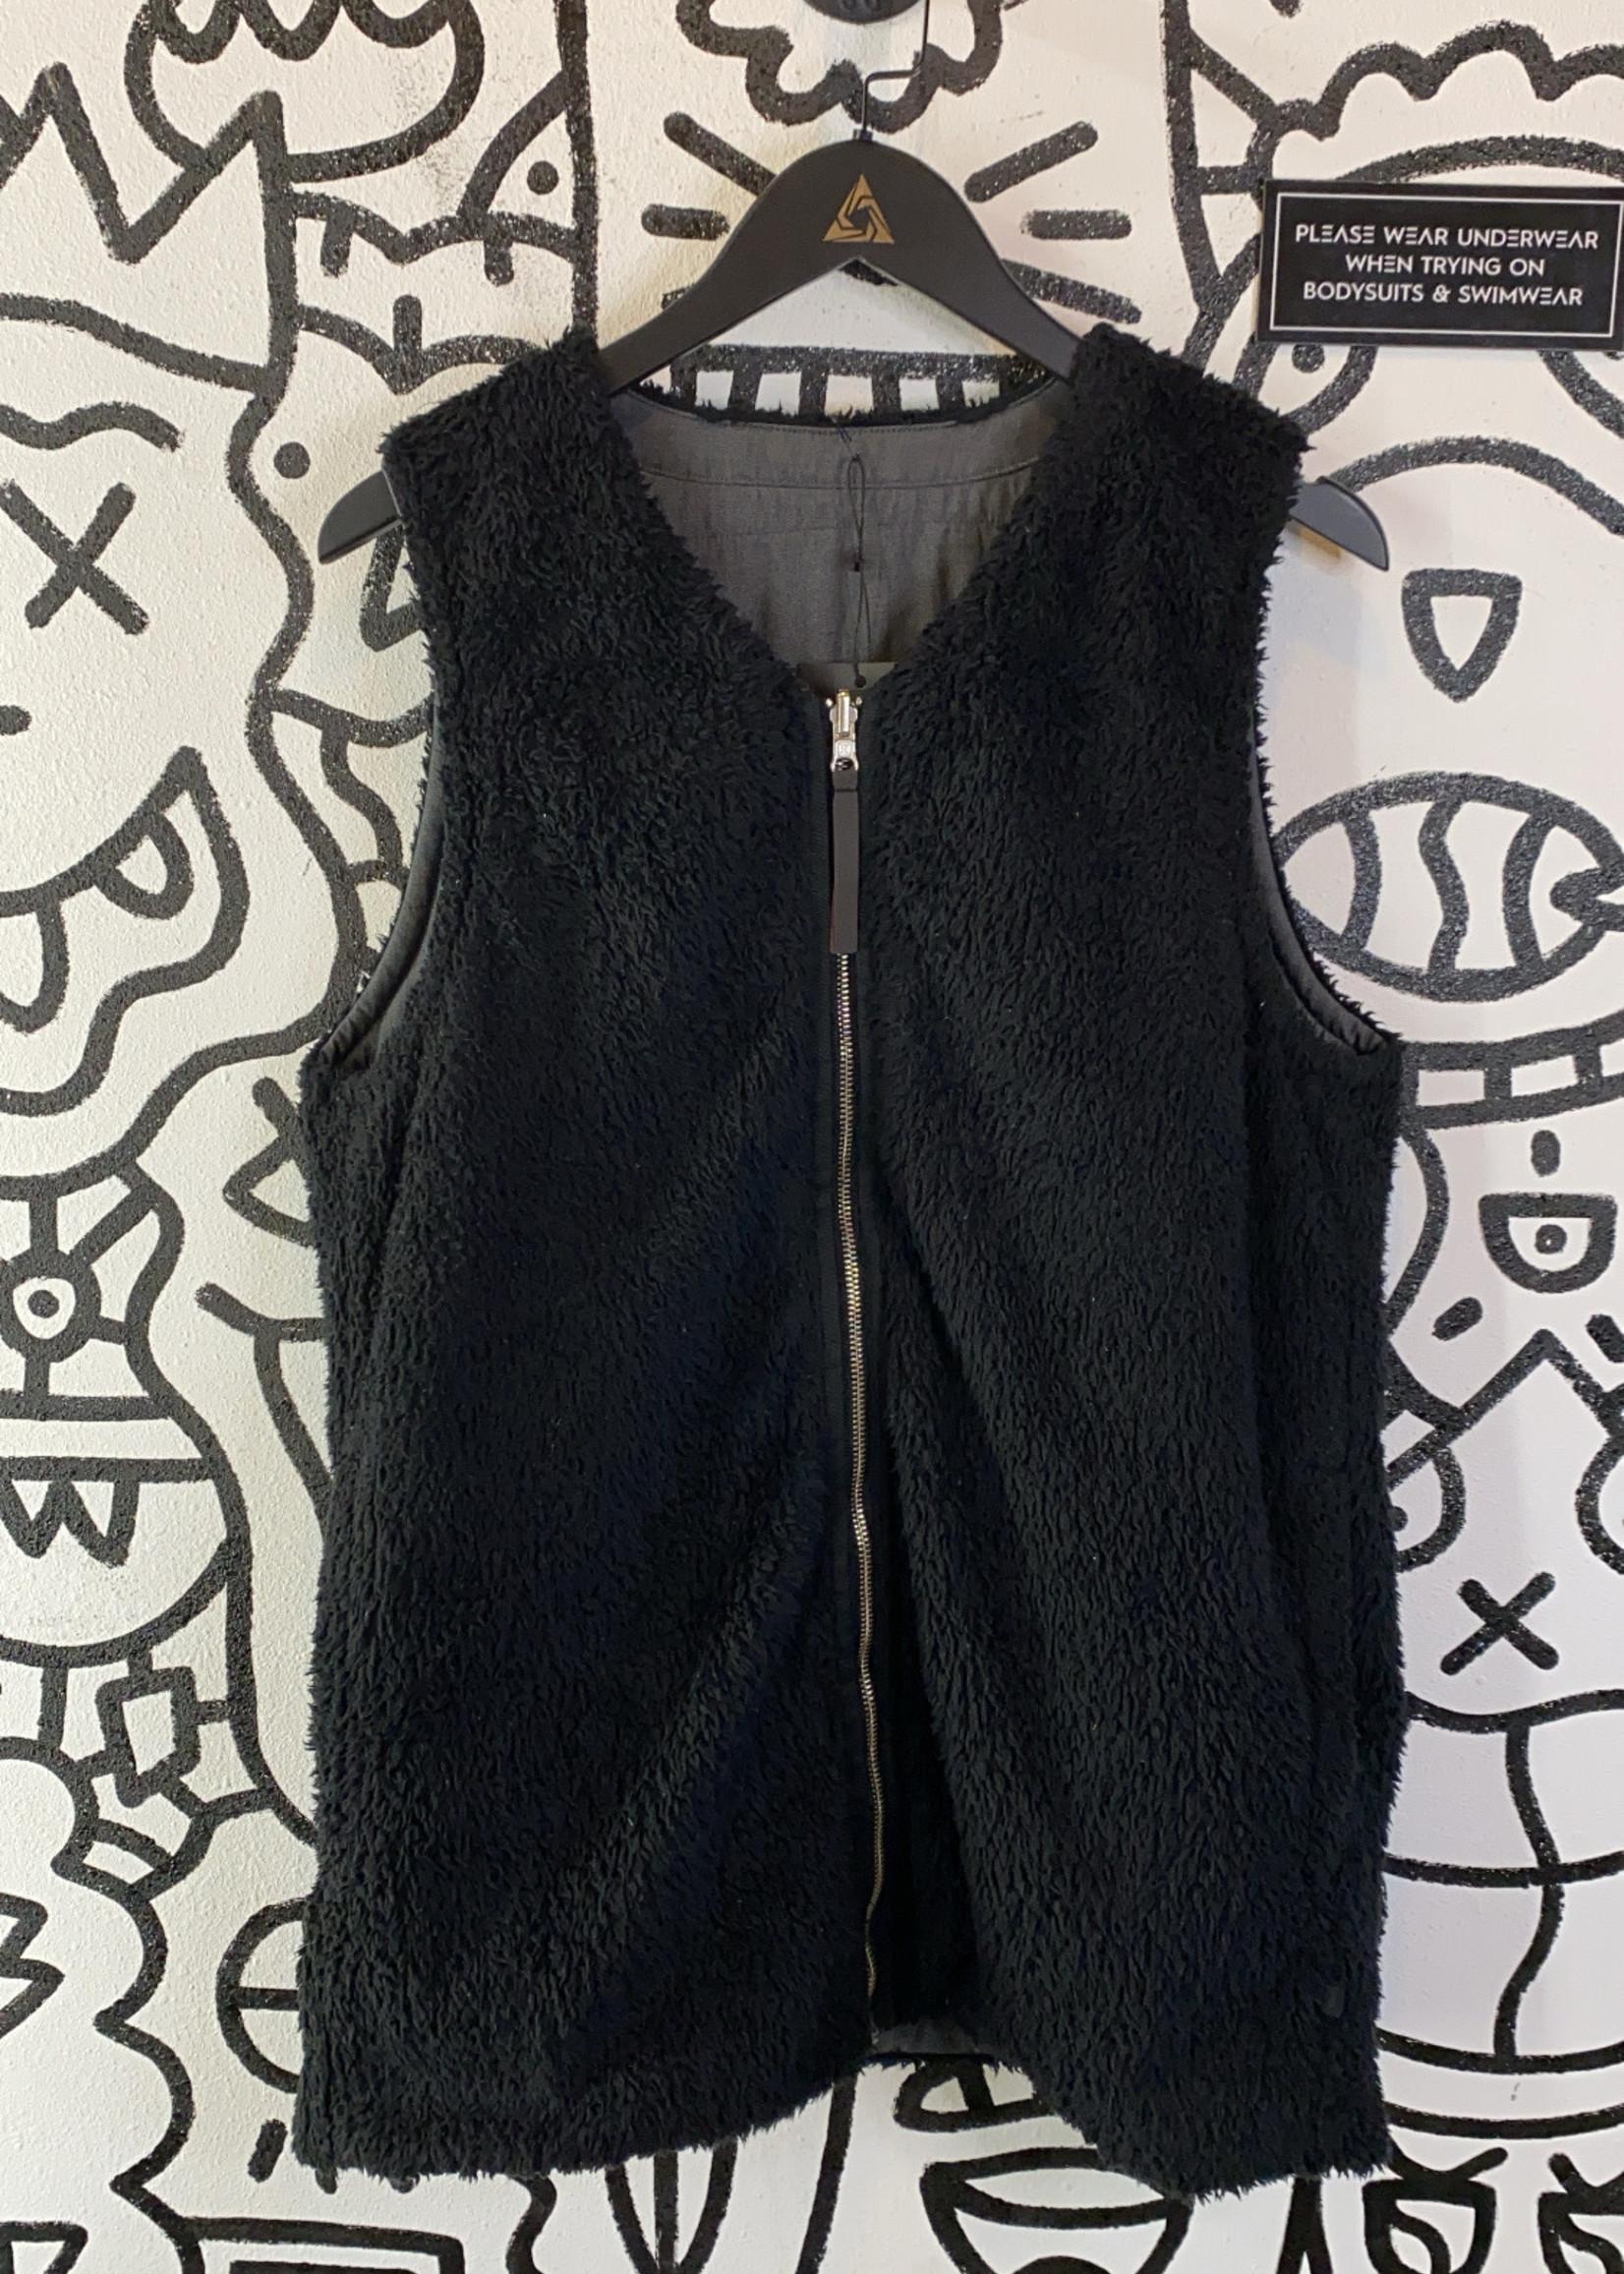 Lululemon Black/Grey Reversible Fuzzy Vest 6